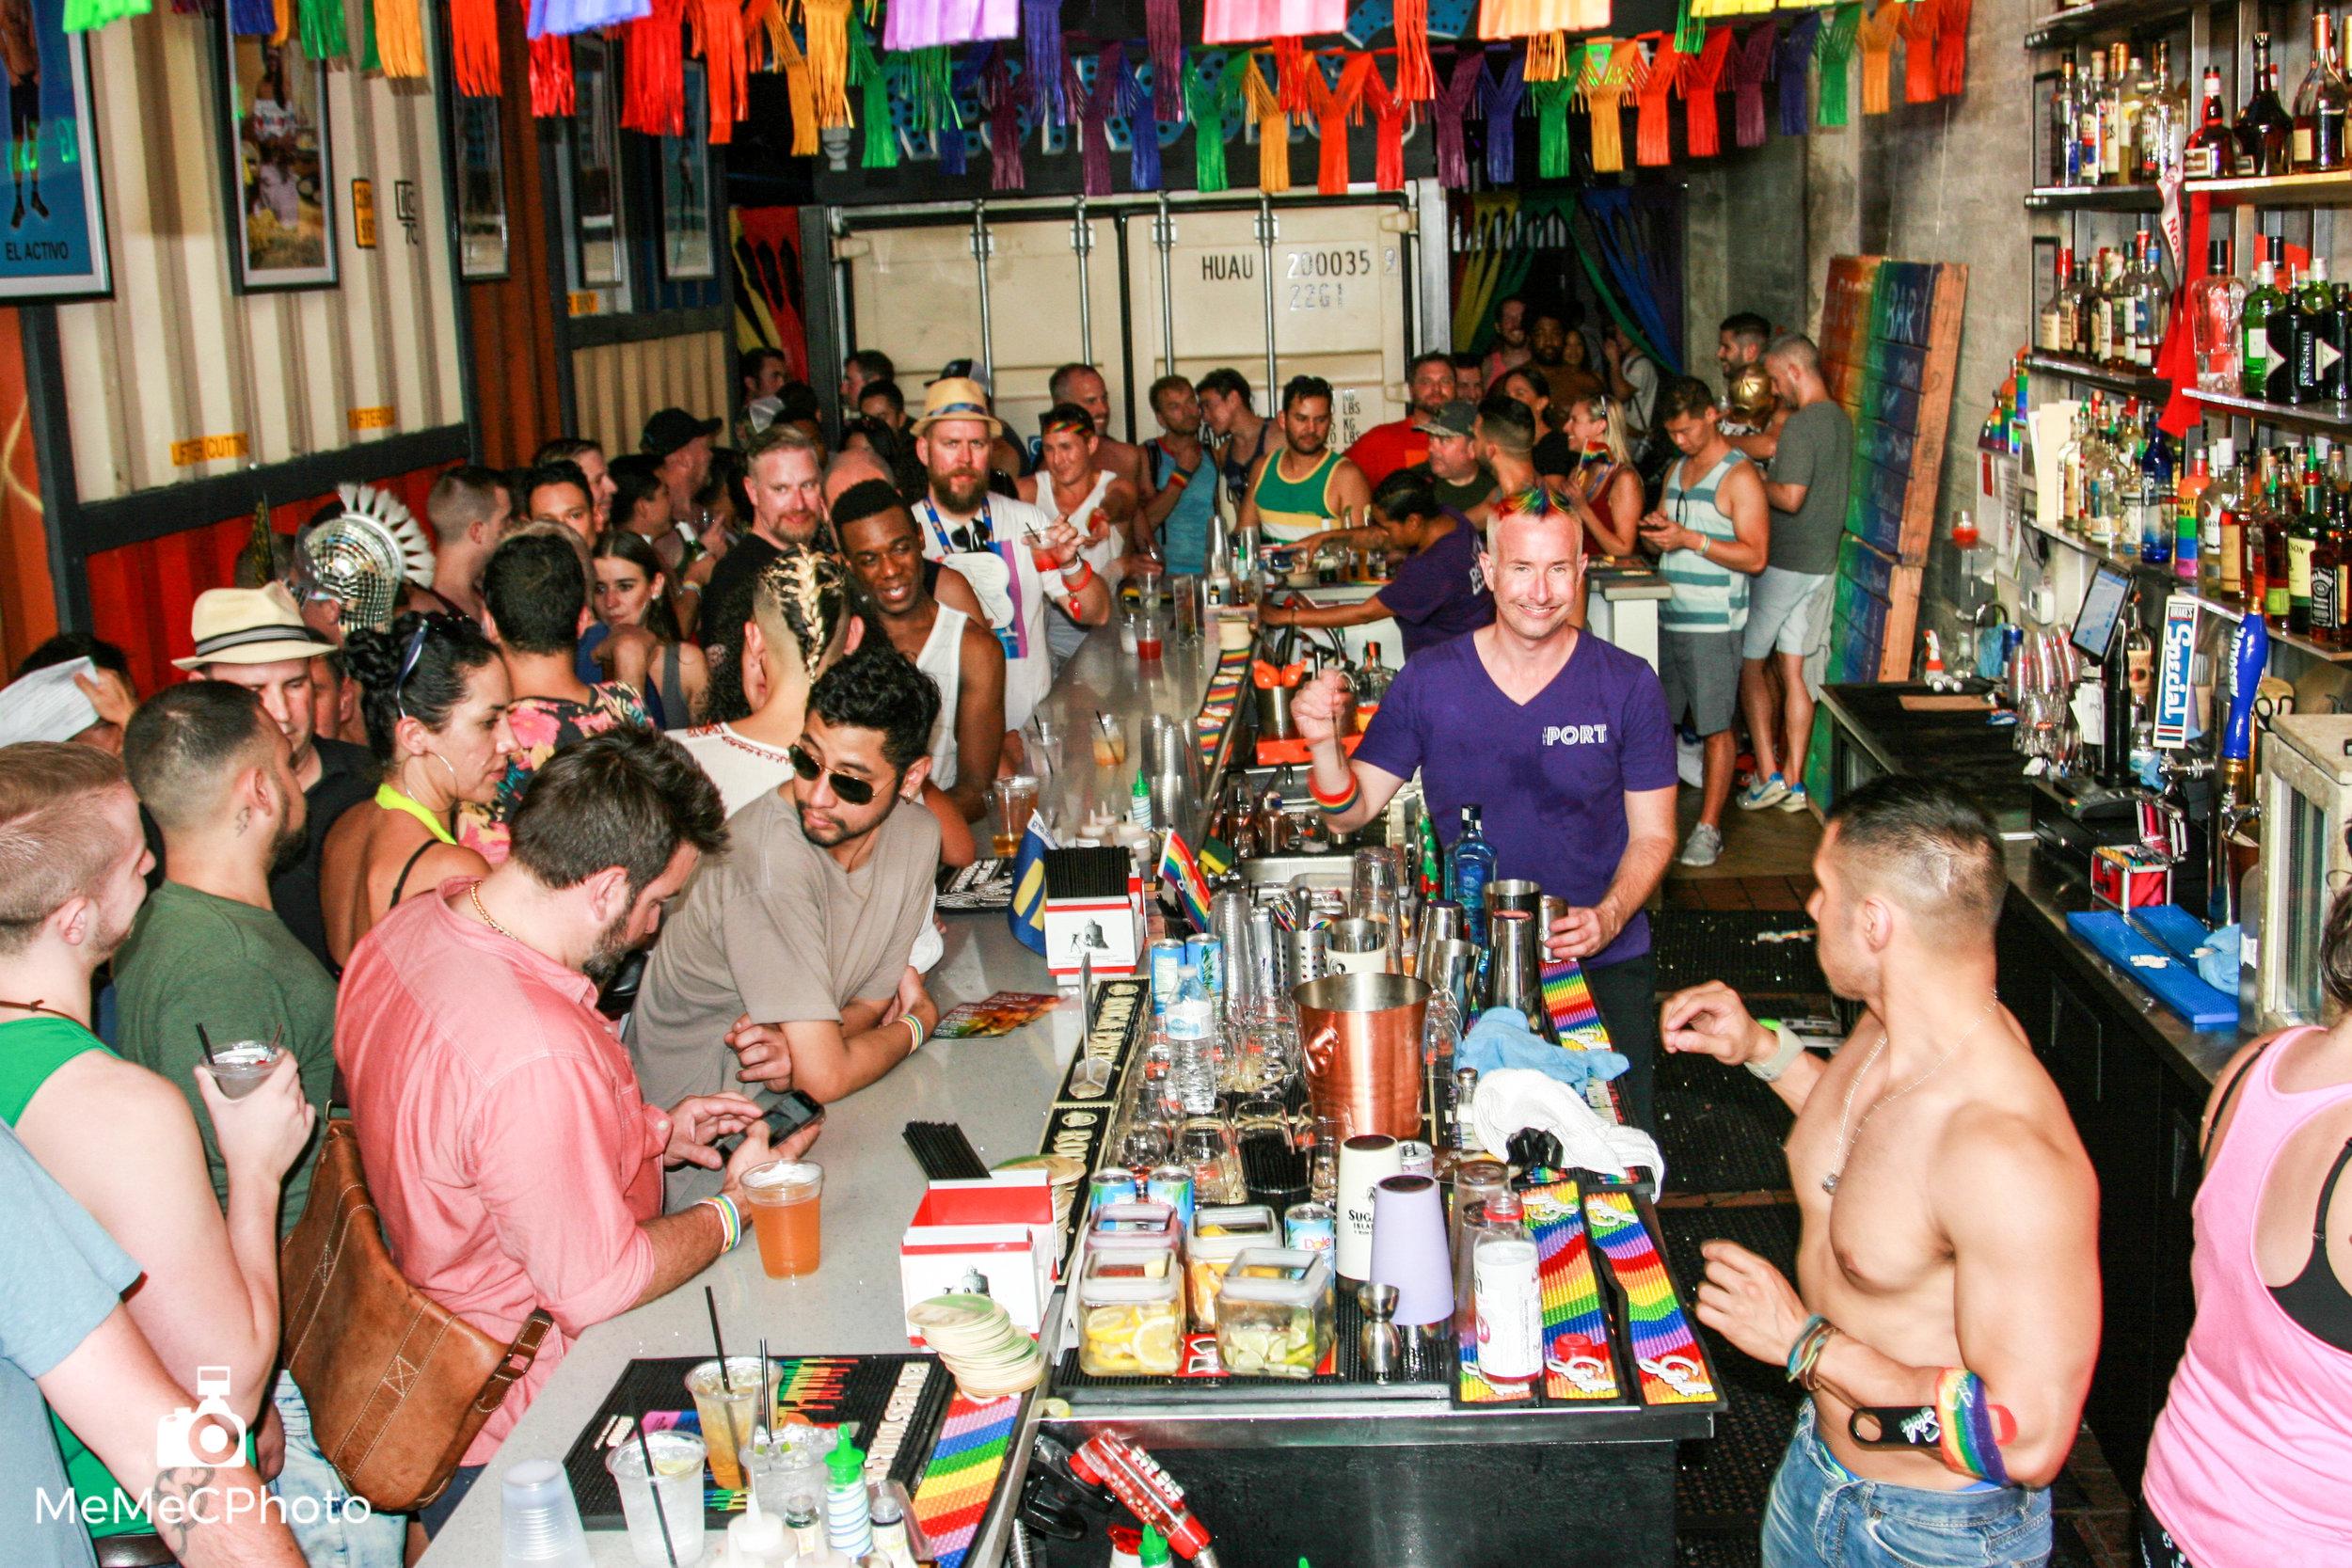 Port Bar Oakland Pride - 150-138.jpg